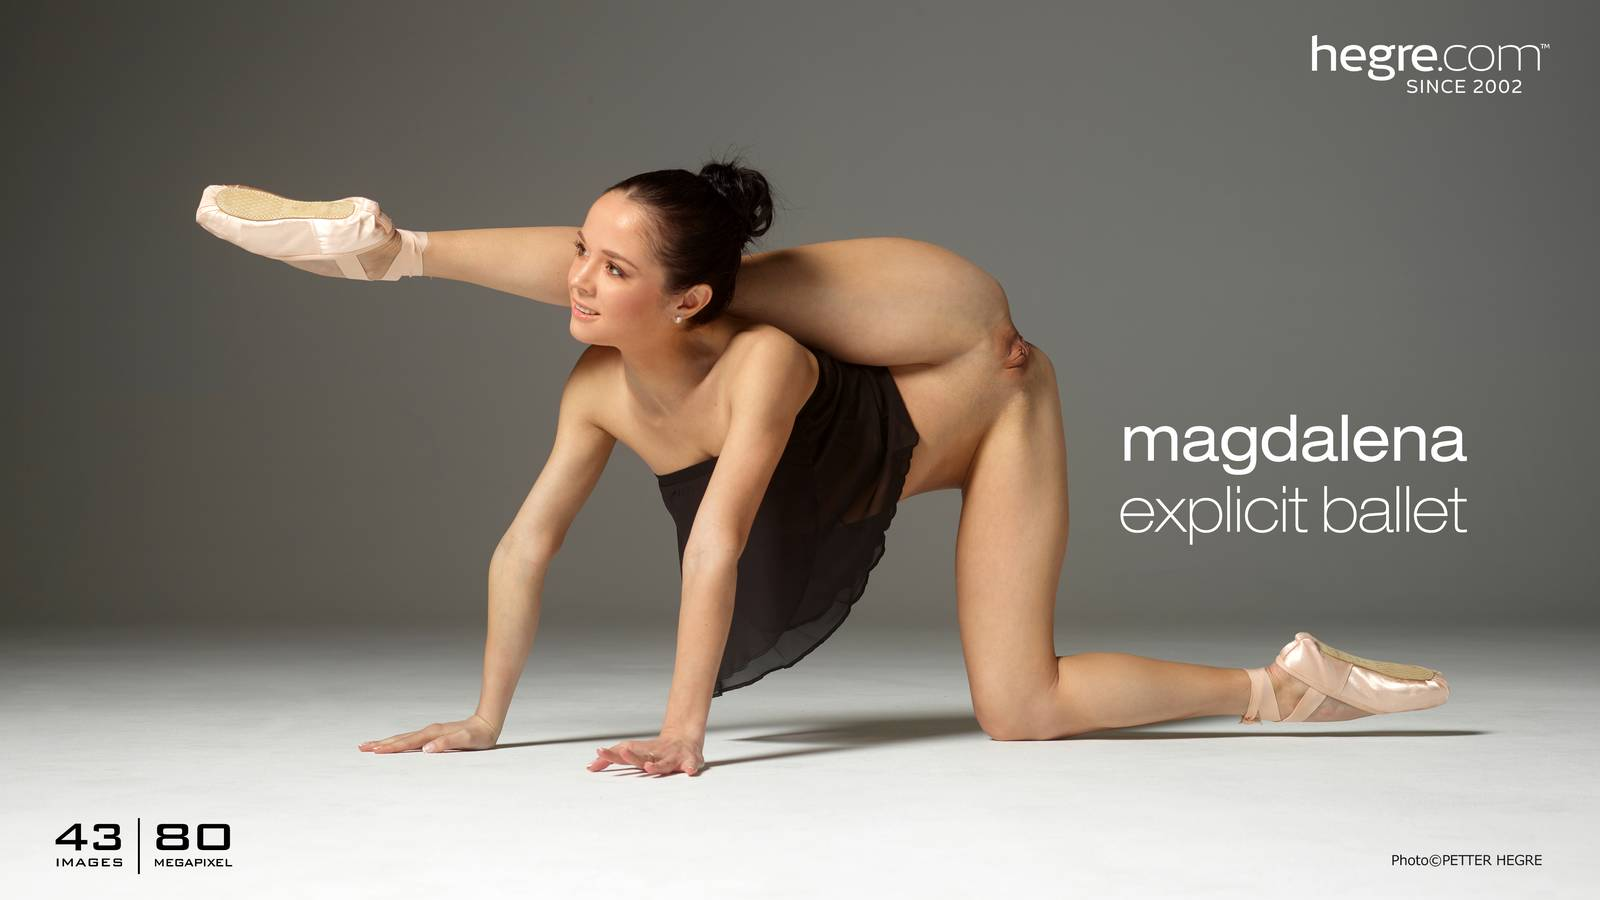 Magdalena hegre